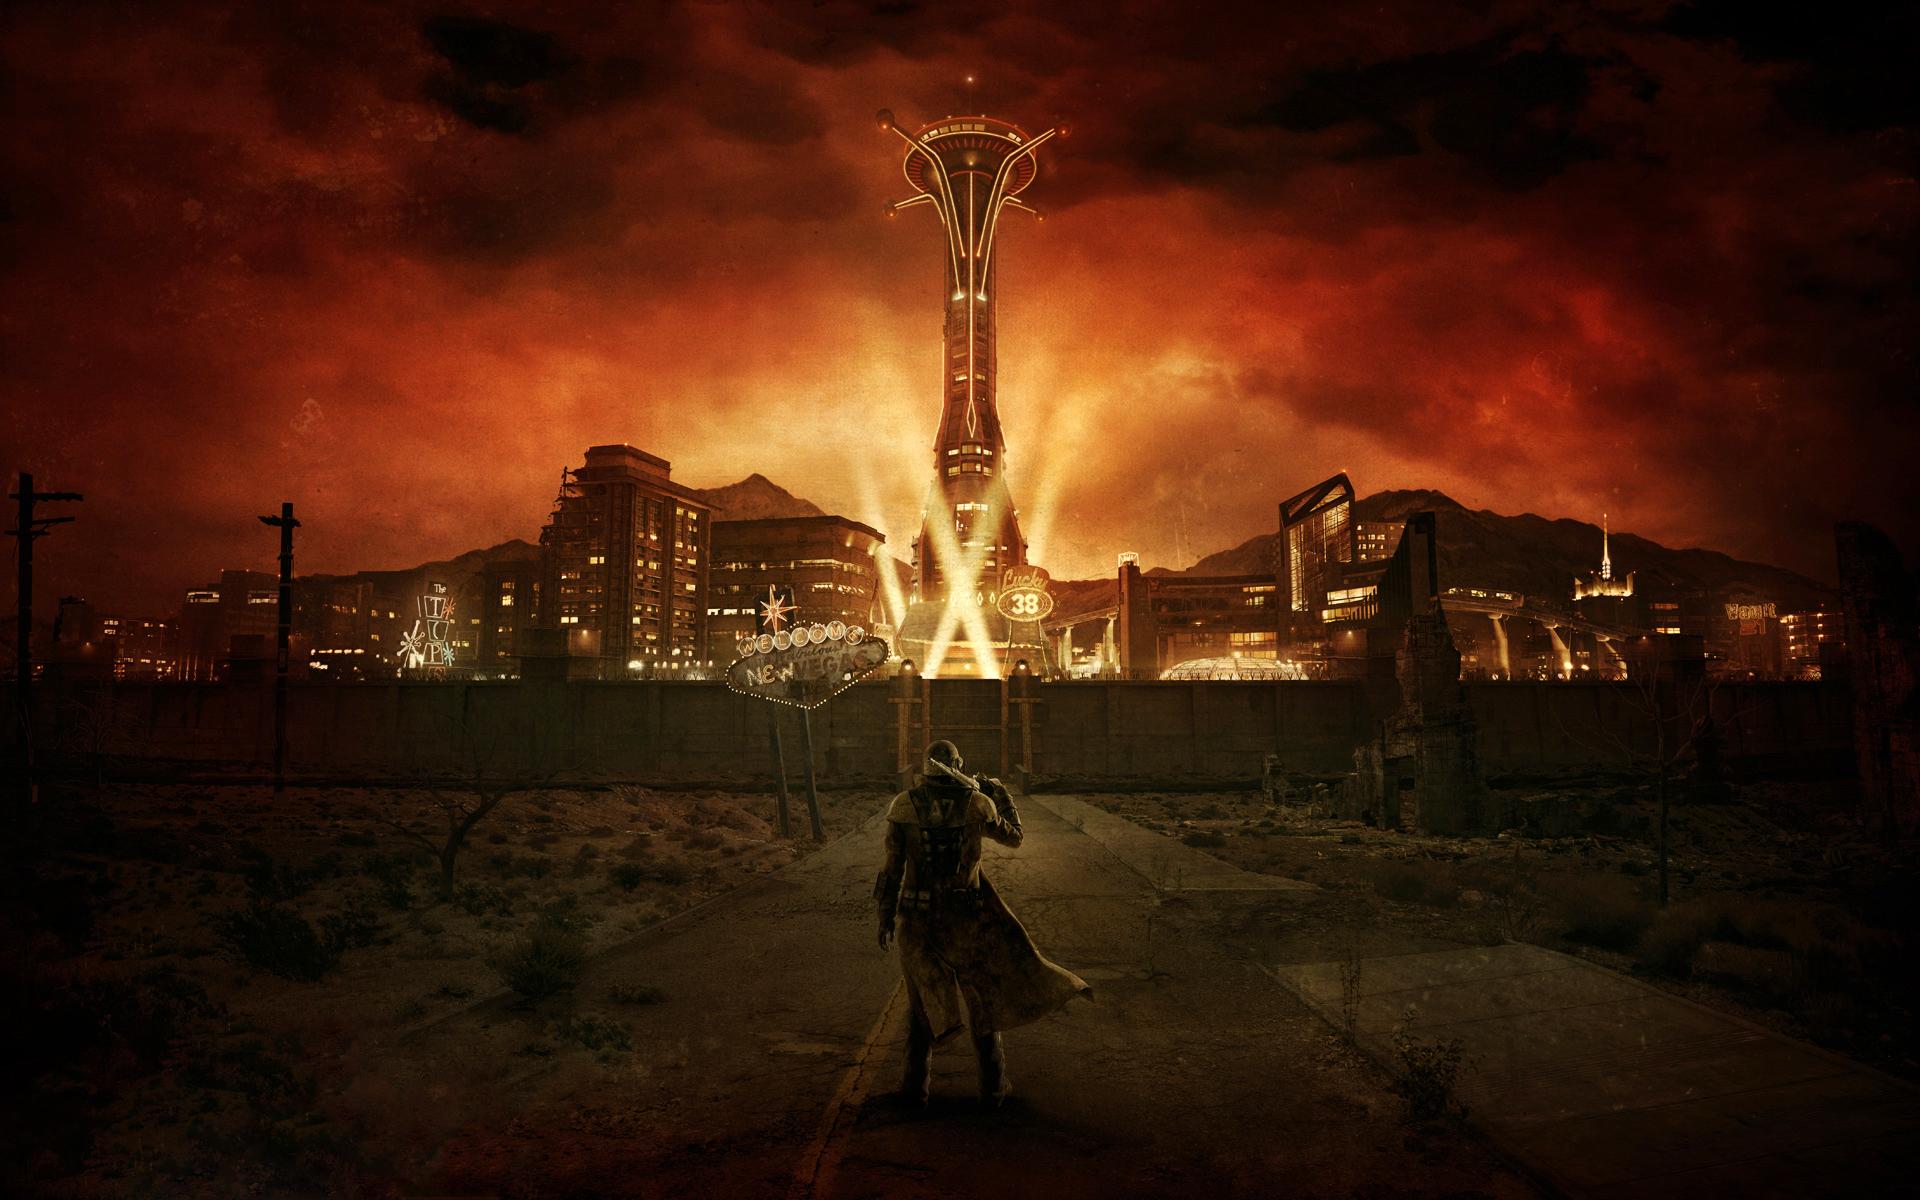 Fallout New Vegas, Bioshock, and Player Choice